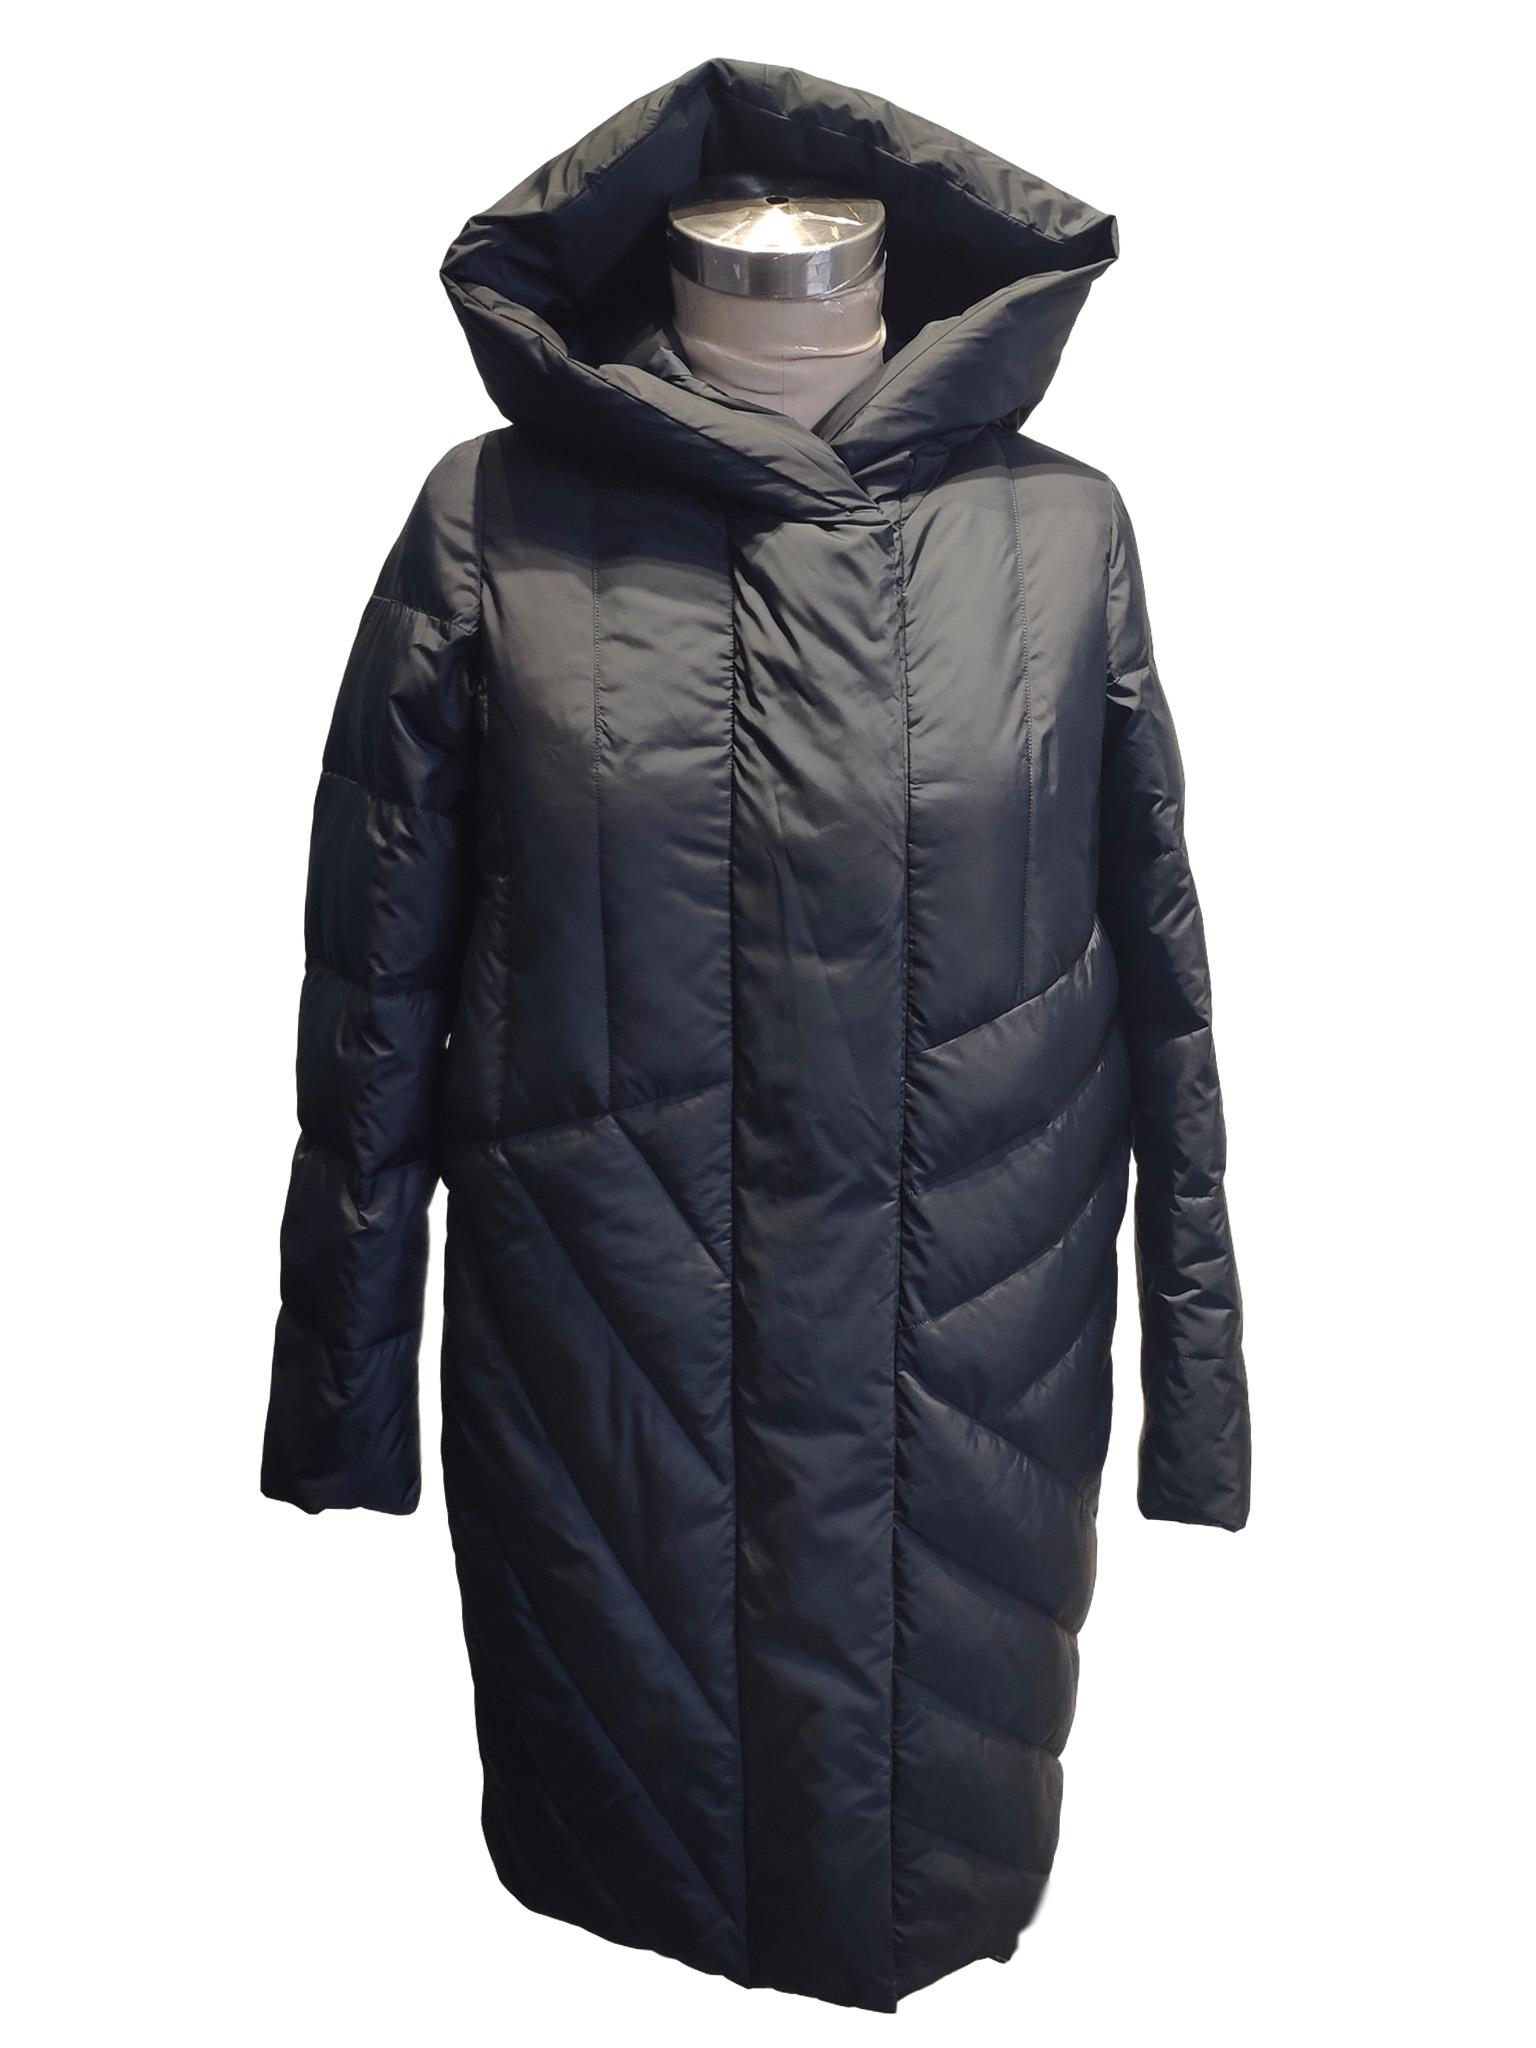 best down jacket cost